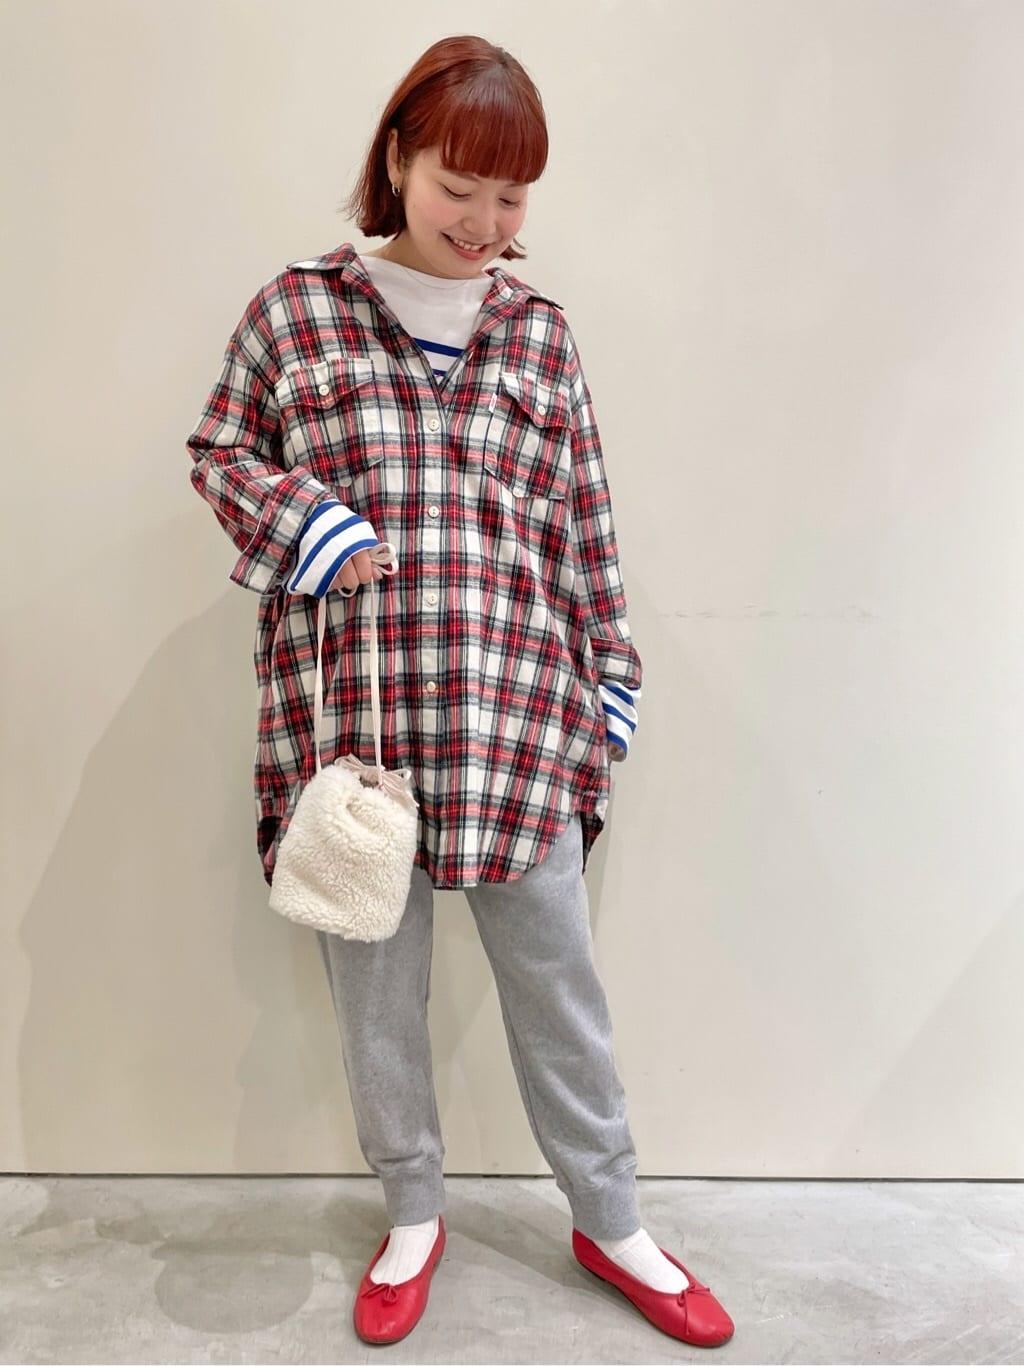 Dot and Stripes CHILD WOMAN CHILD WOMAN , PAR ICI 新宿ミロード 身長:160cm 2021.09.12